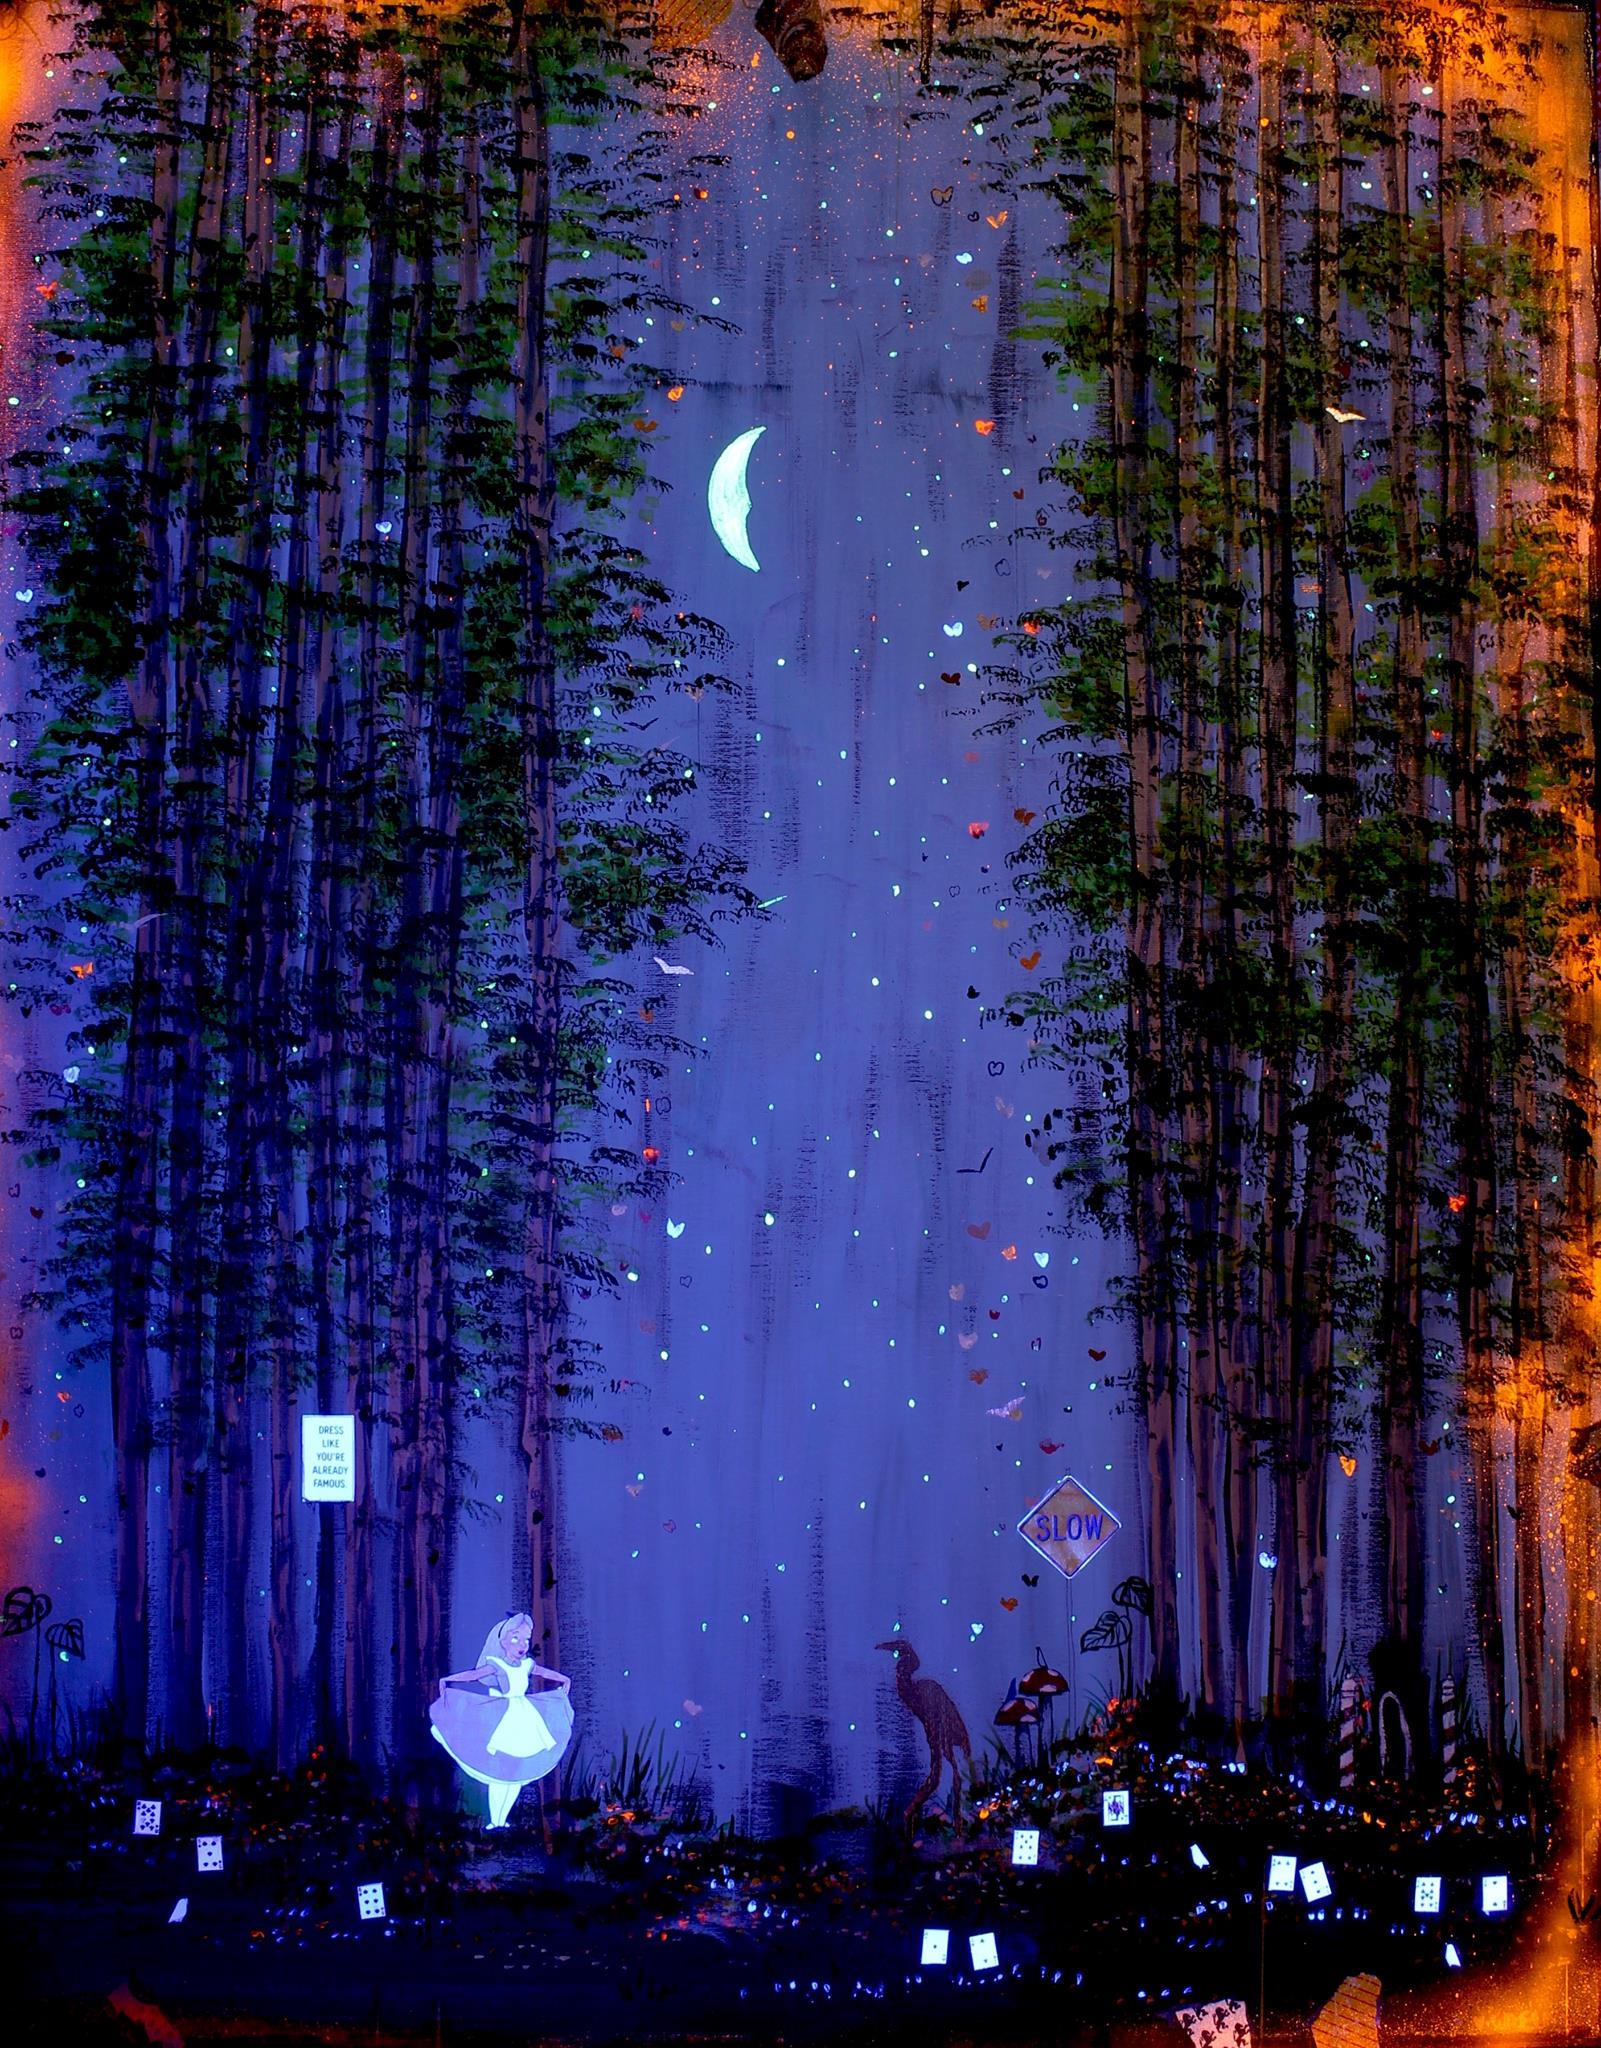 Starring Alice - UV Light